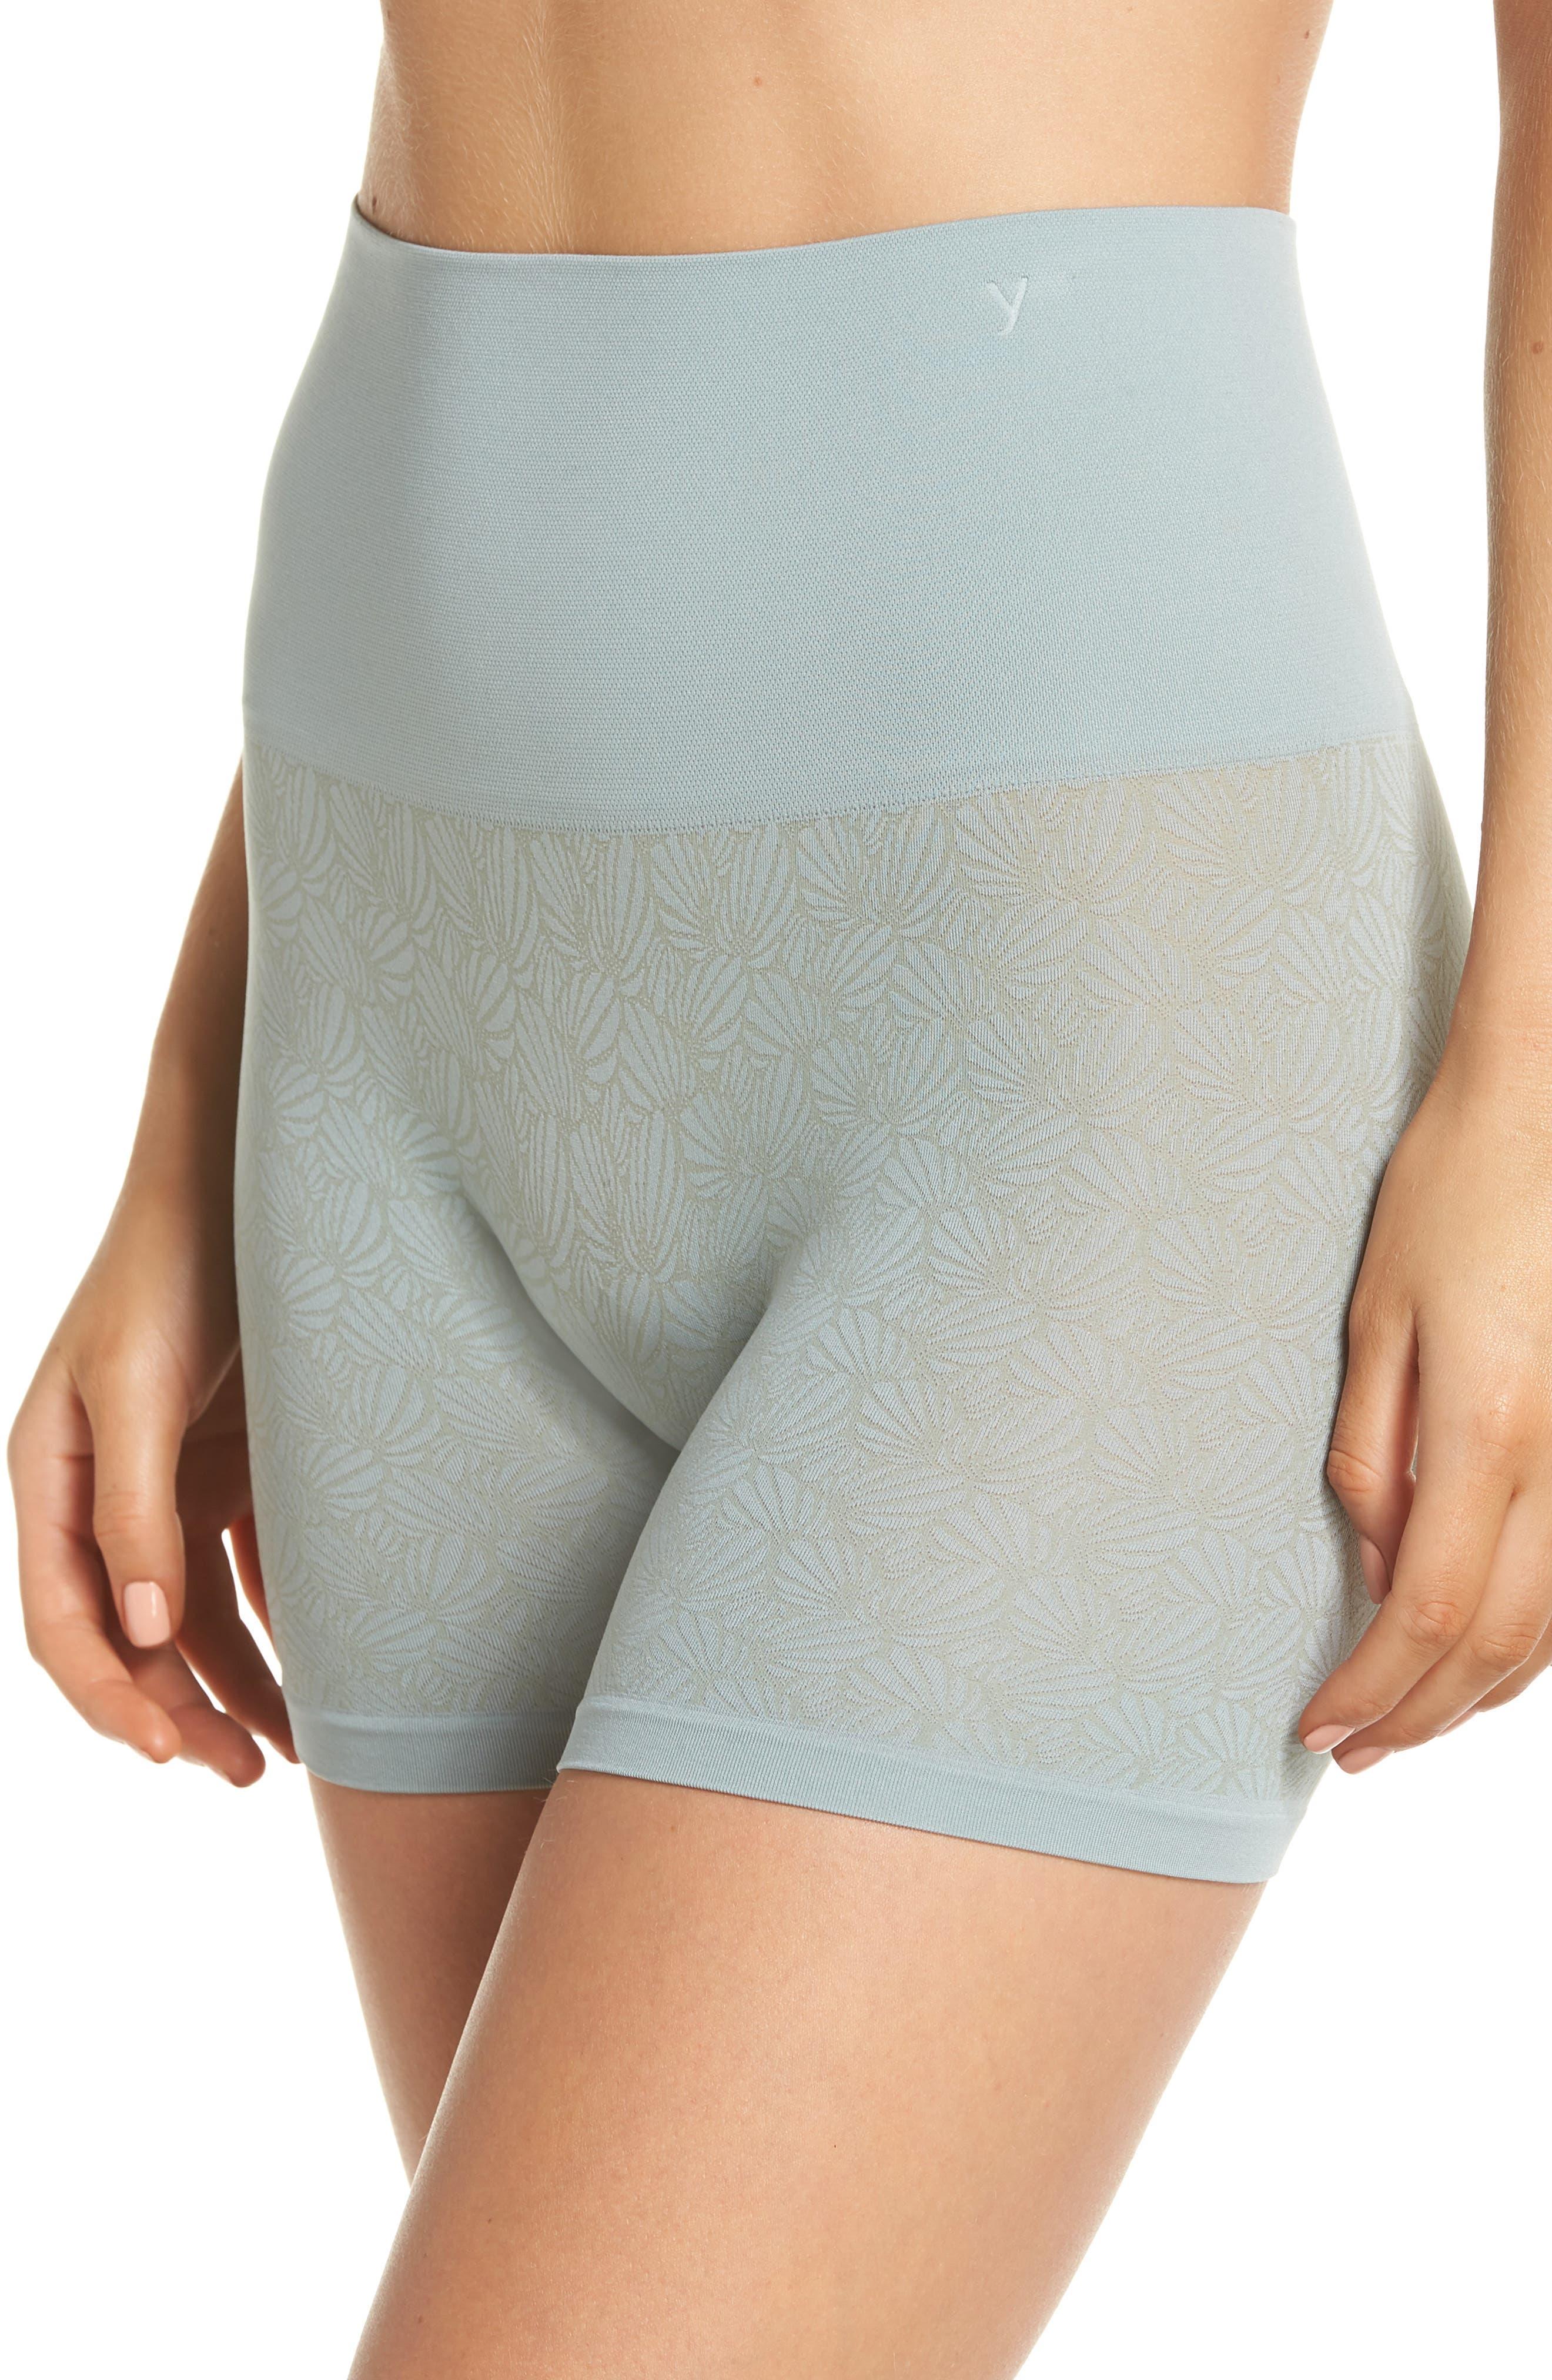 Ultralight Seamless Shaping Shorts,                             Alternate thumbnail 4, color,                             SILVER BLUE